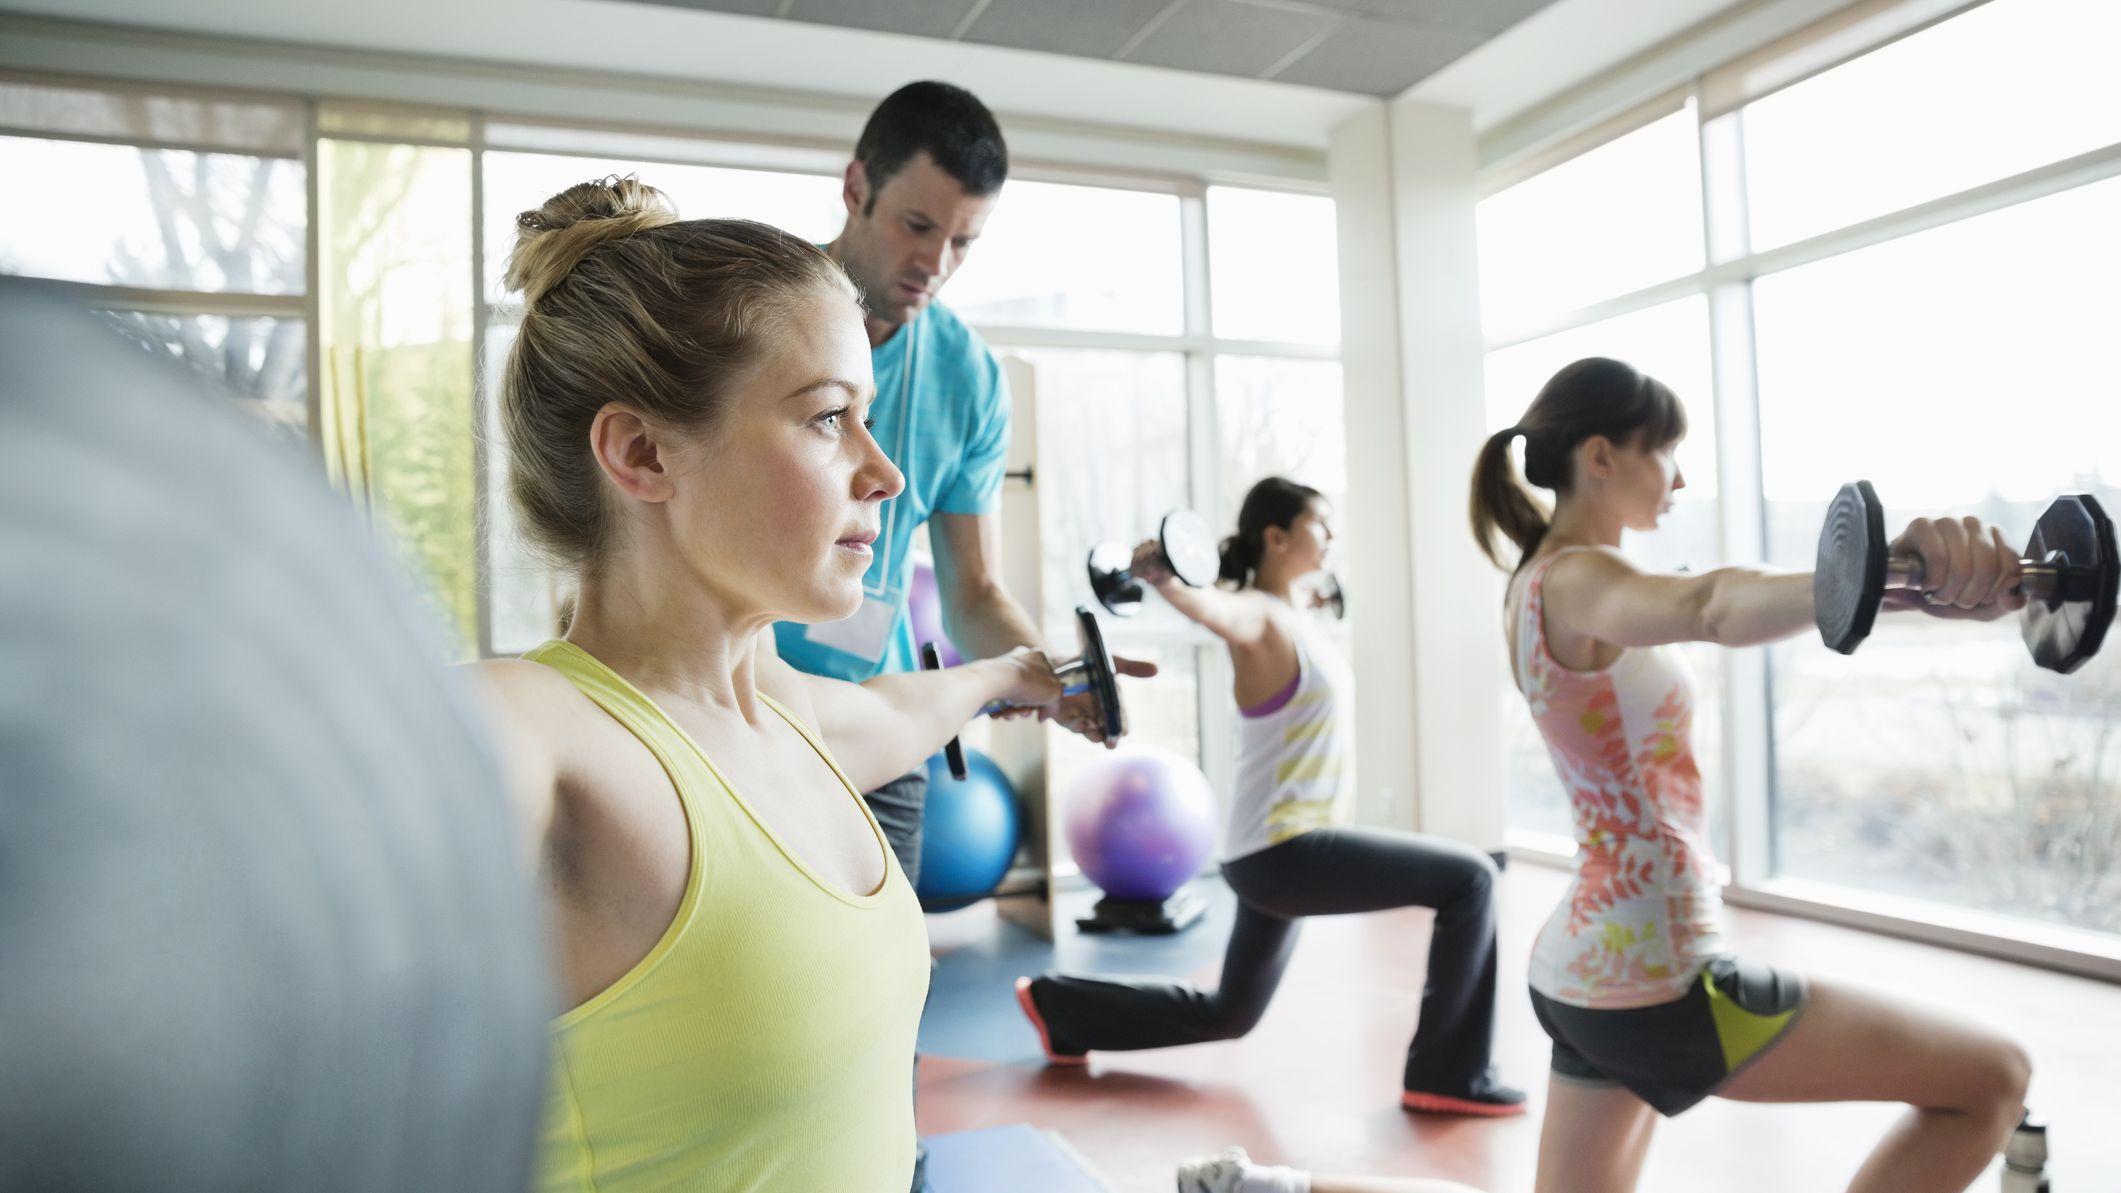 3 Best exercies that guarantee weight loss